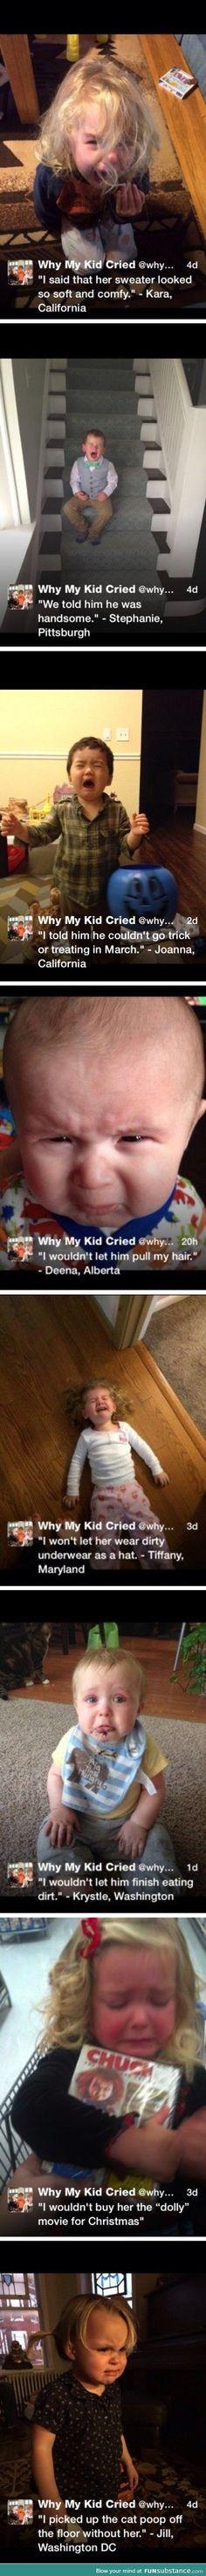 Why my kid cried